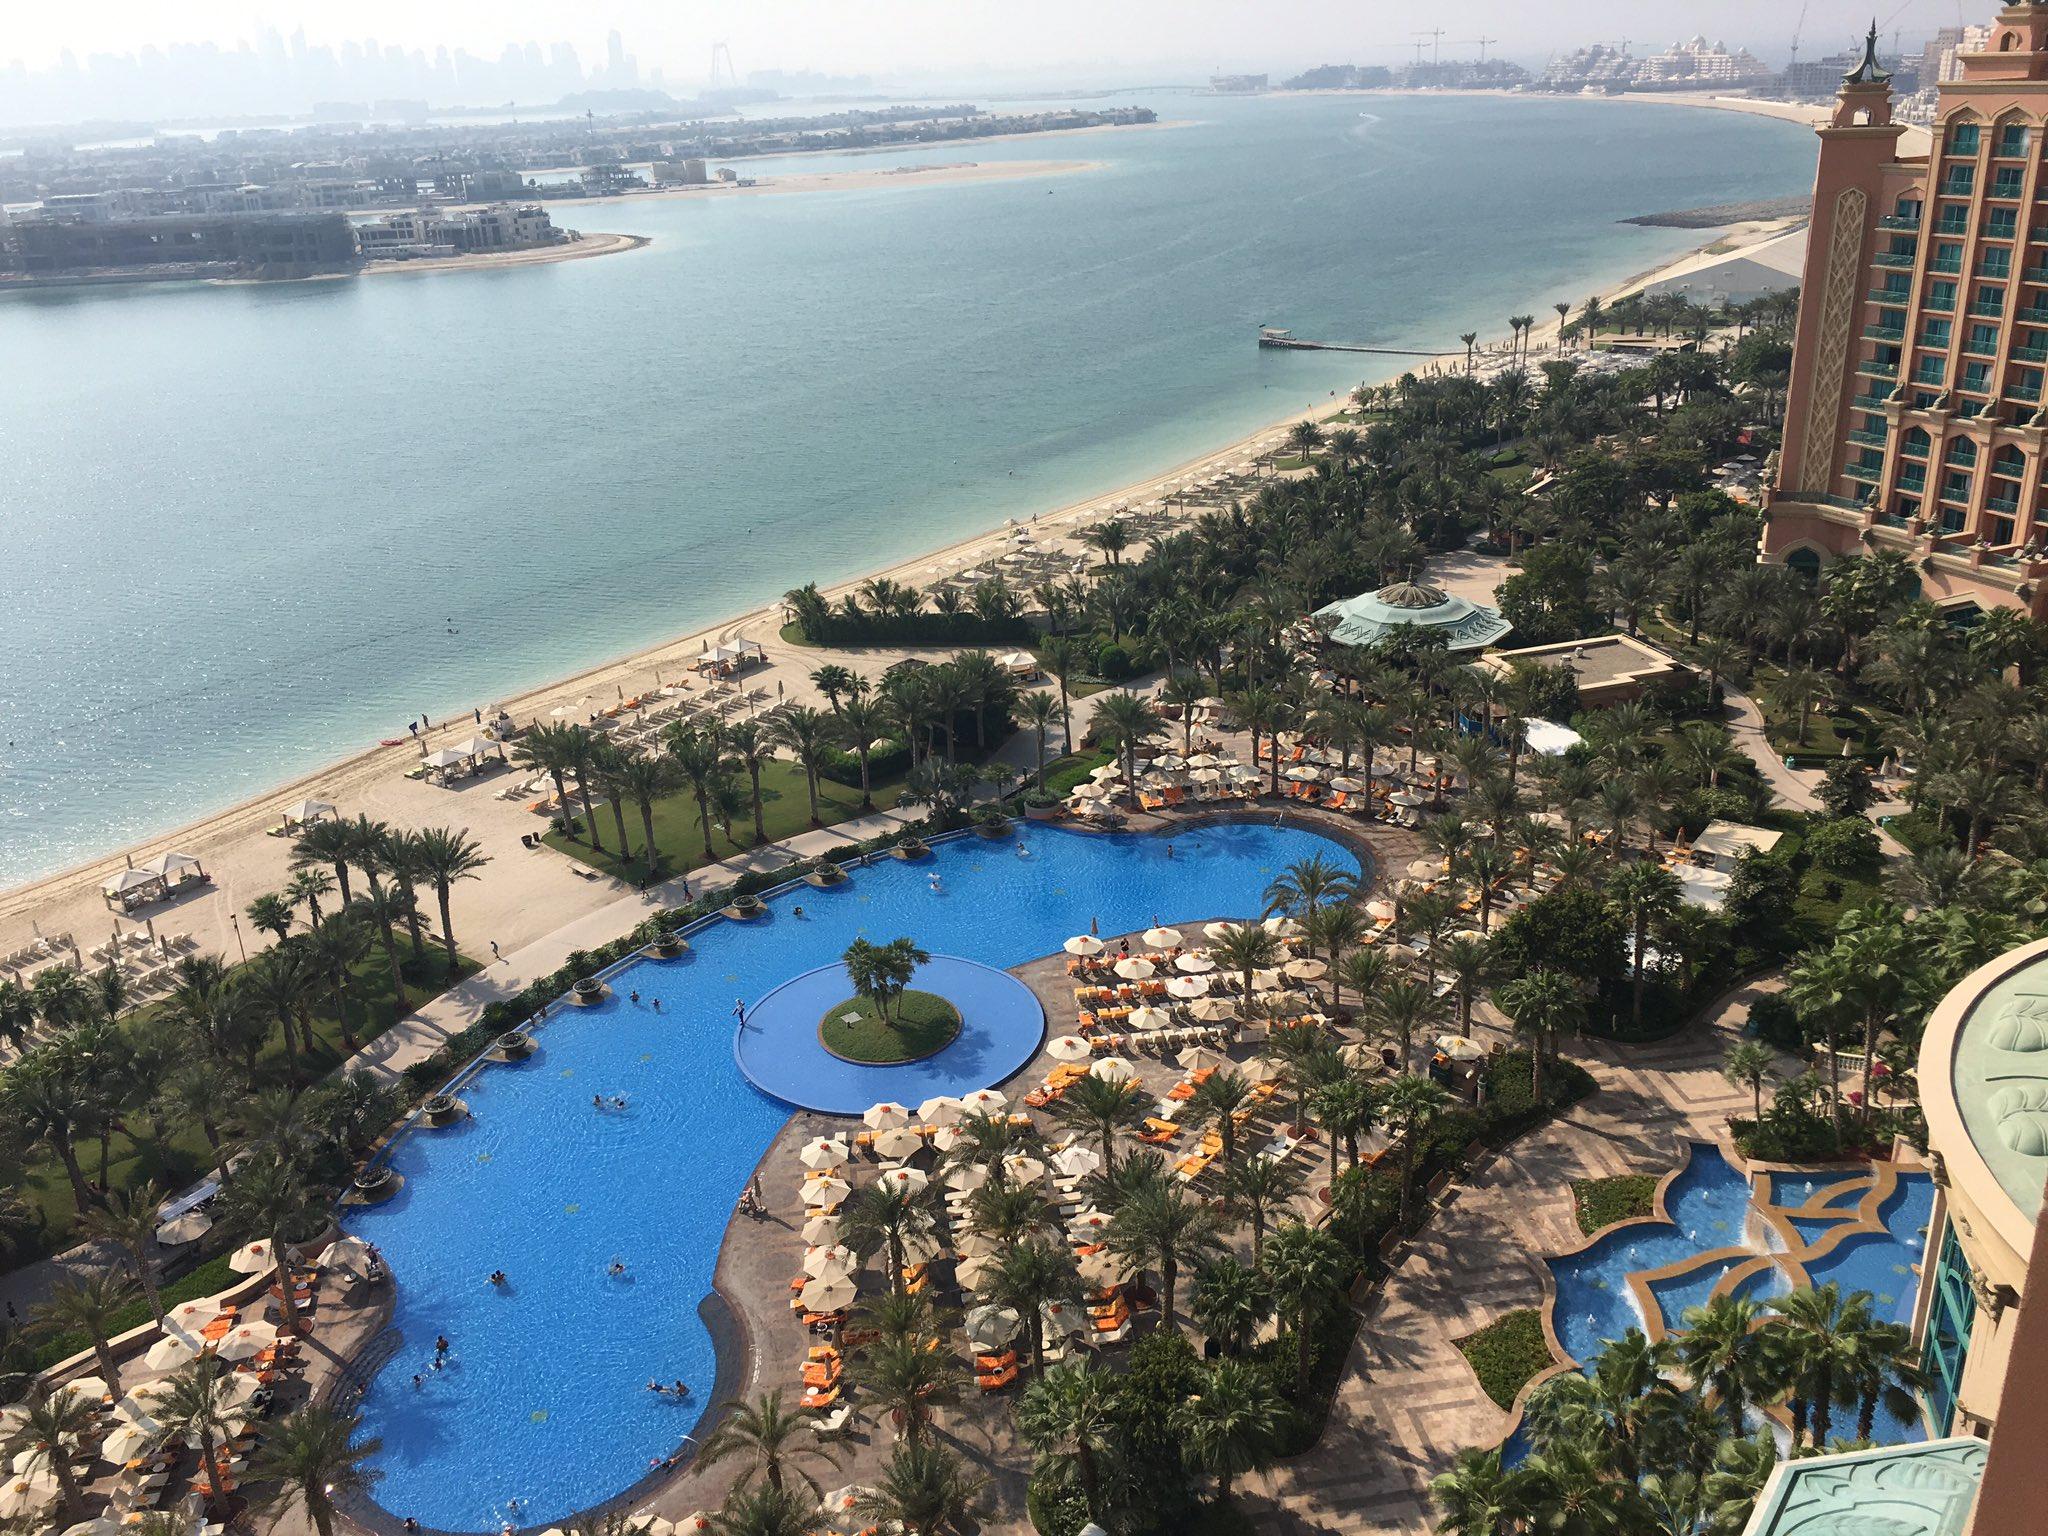 Morning @ATLANTIS #Dubai https://t.co/qZrE7U2wat